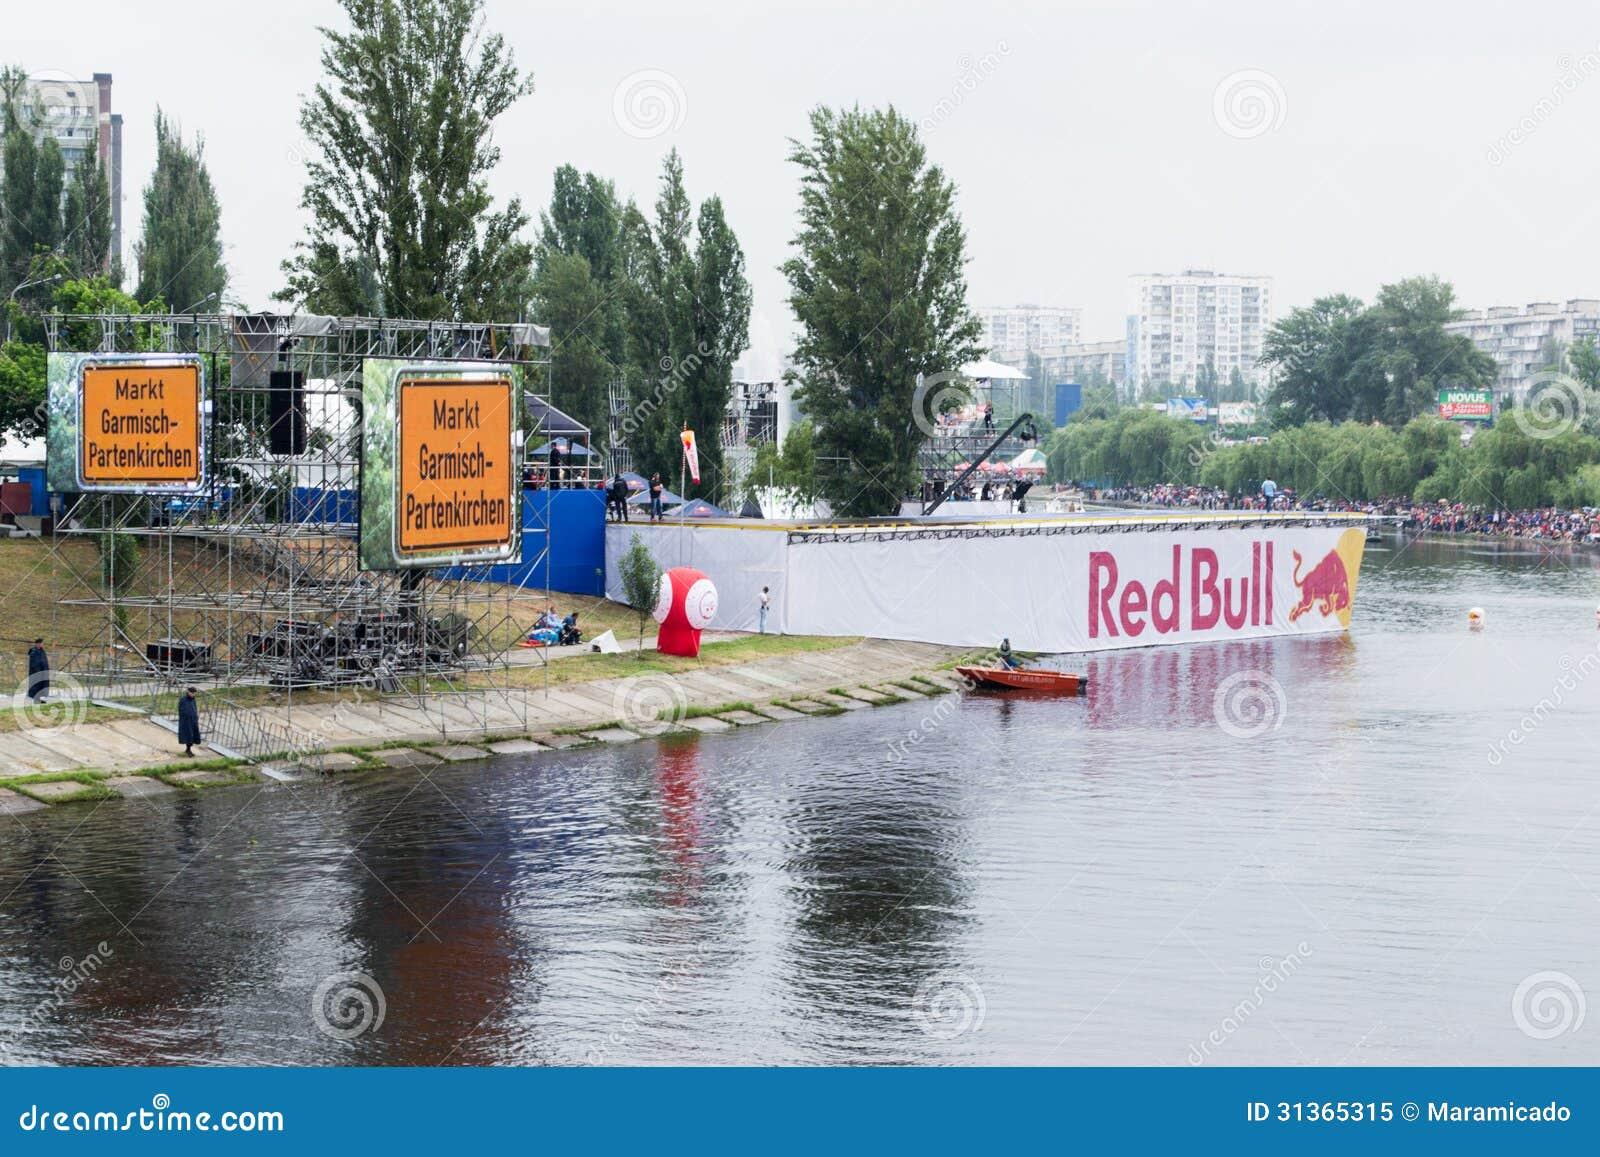 UCRANIA, KIEV 2 de junio Red Bull Flugtag